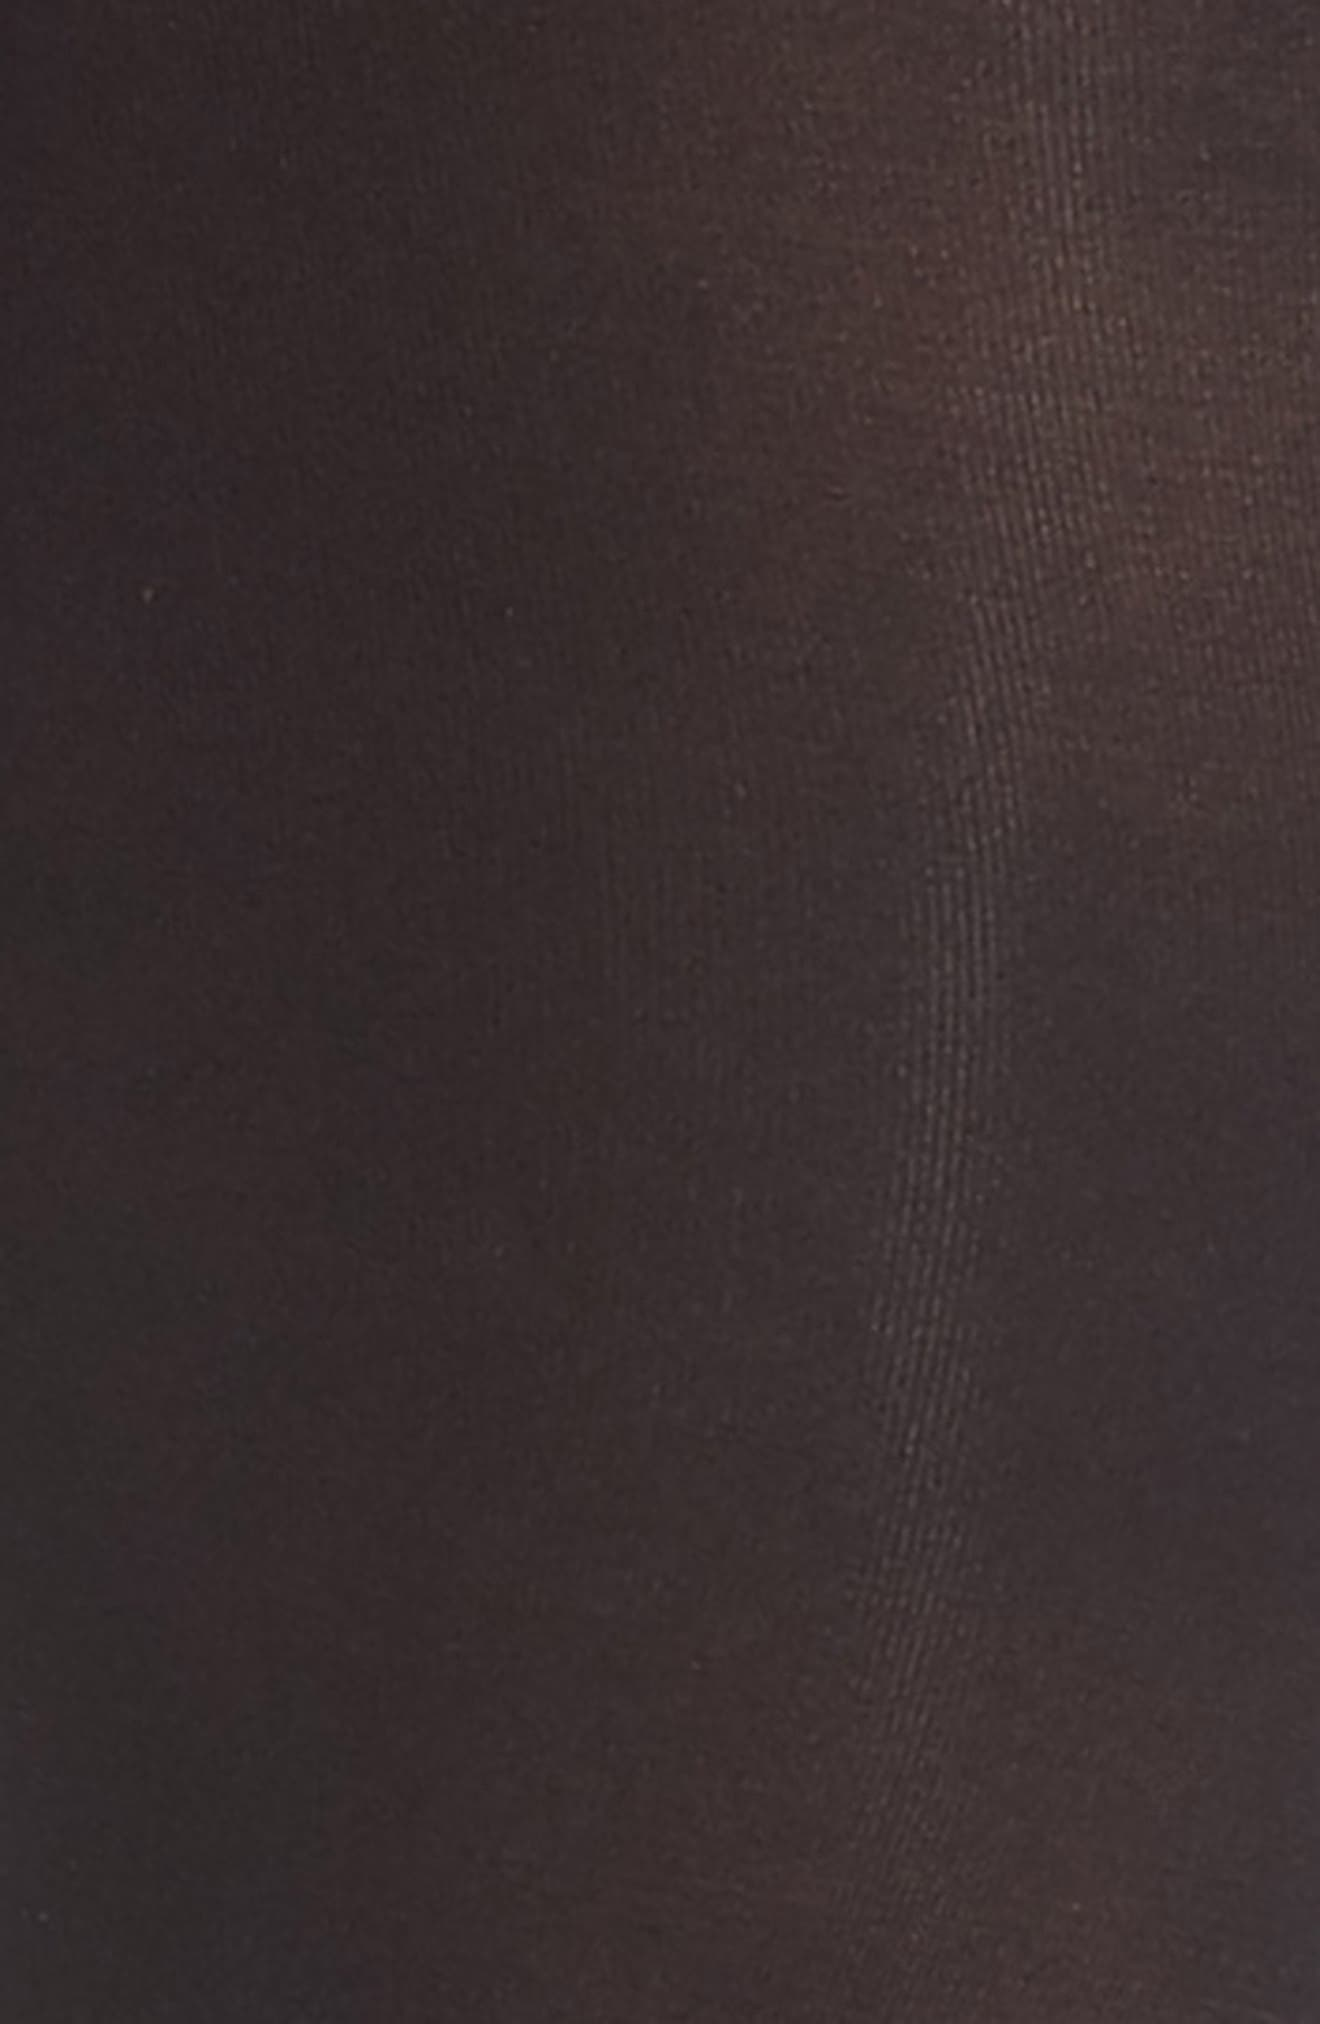 Opaque Control Top Tights,                             Alternate thumbnail 2, color,                             Black